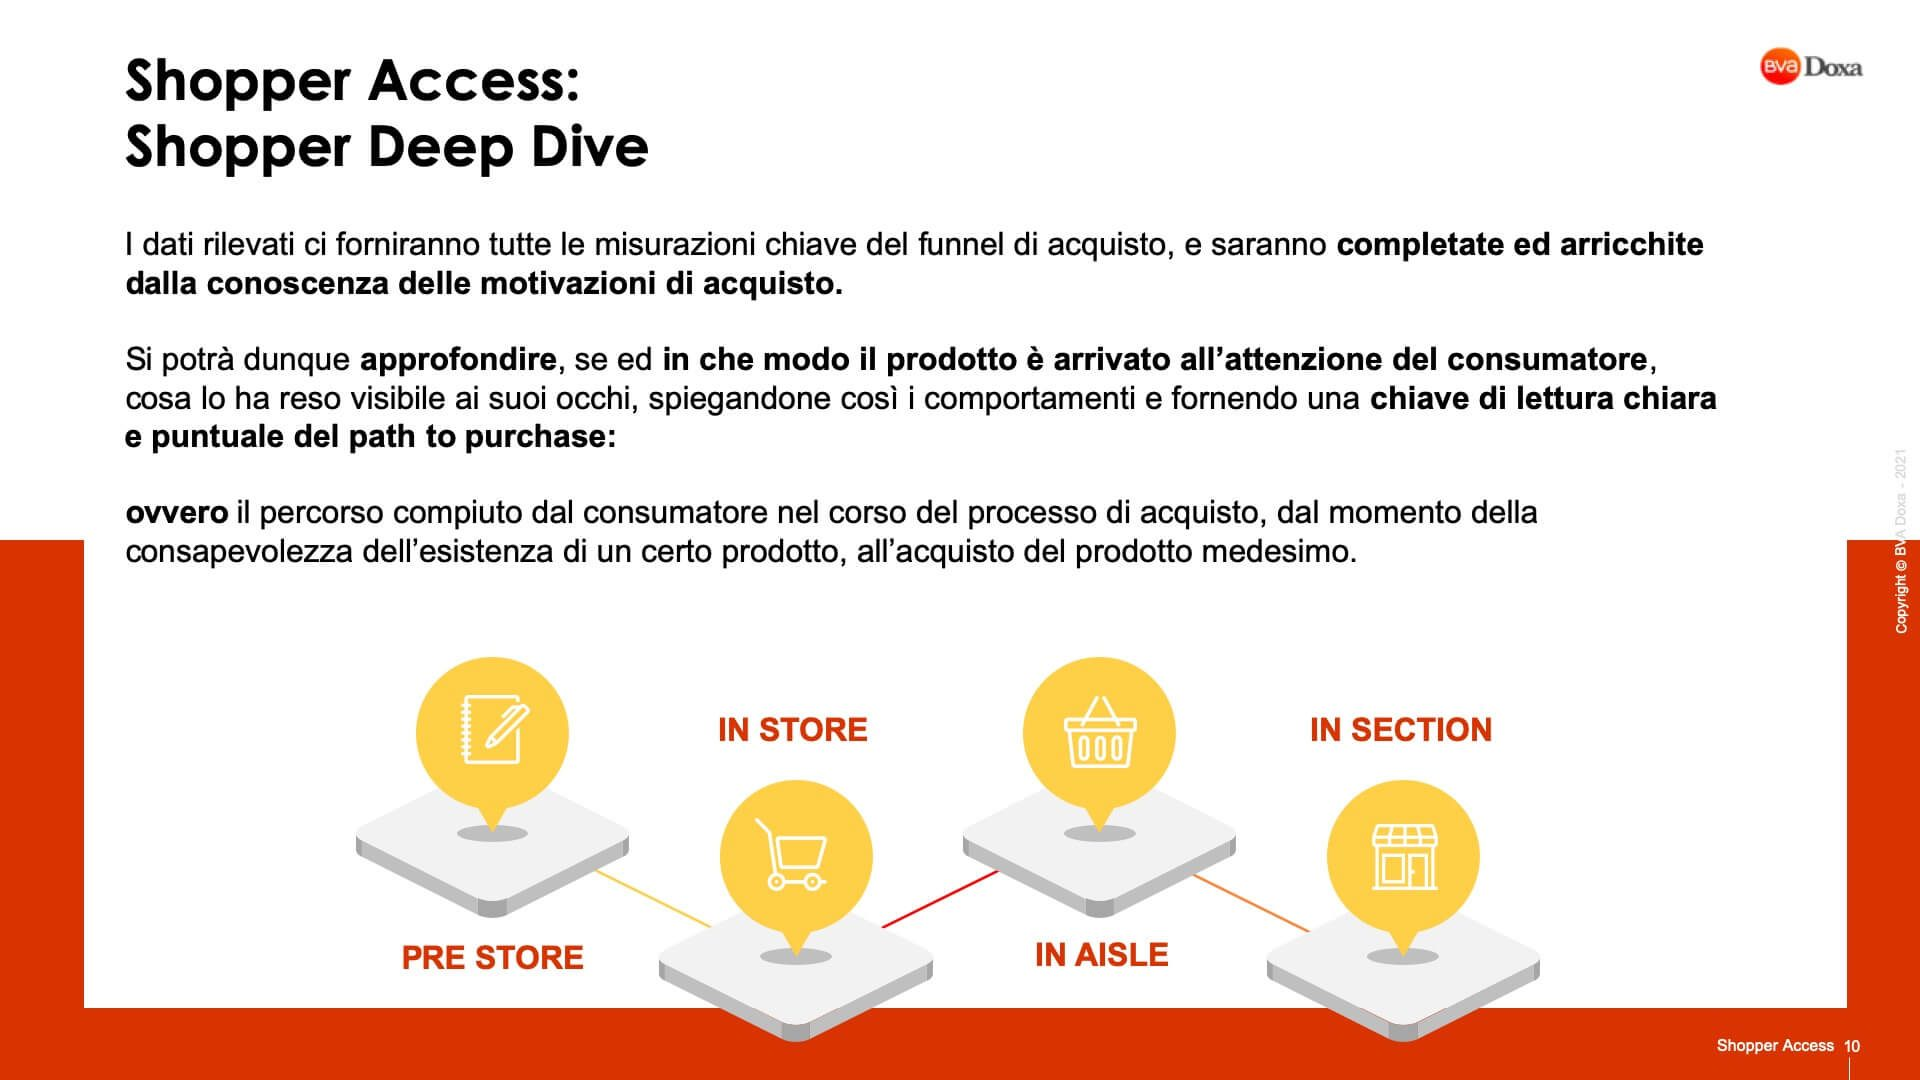 Shopper Access 10